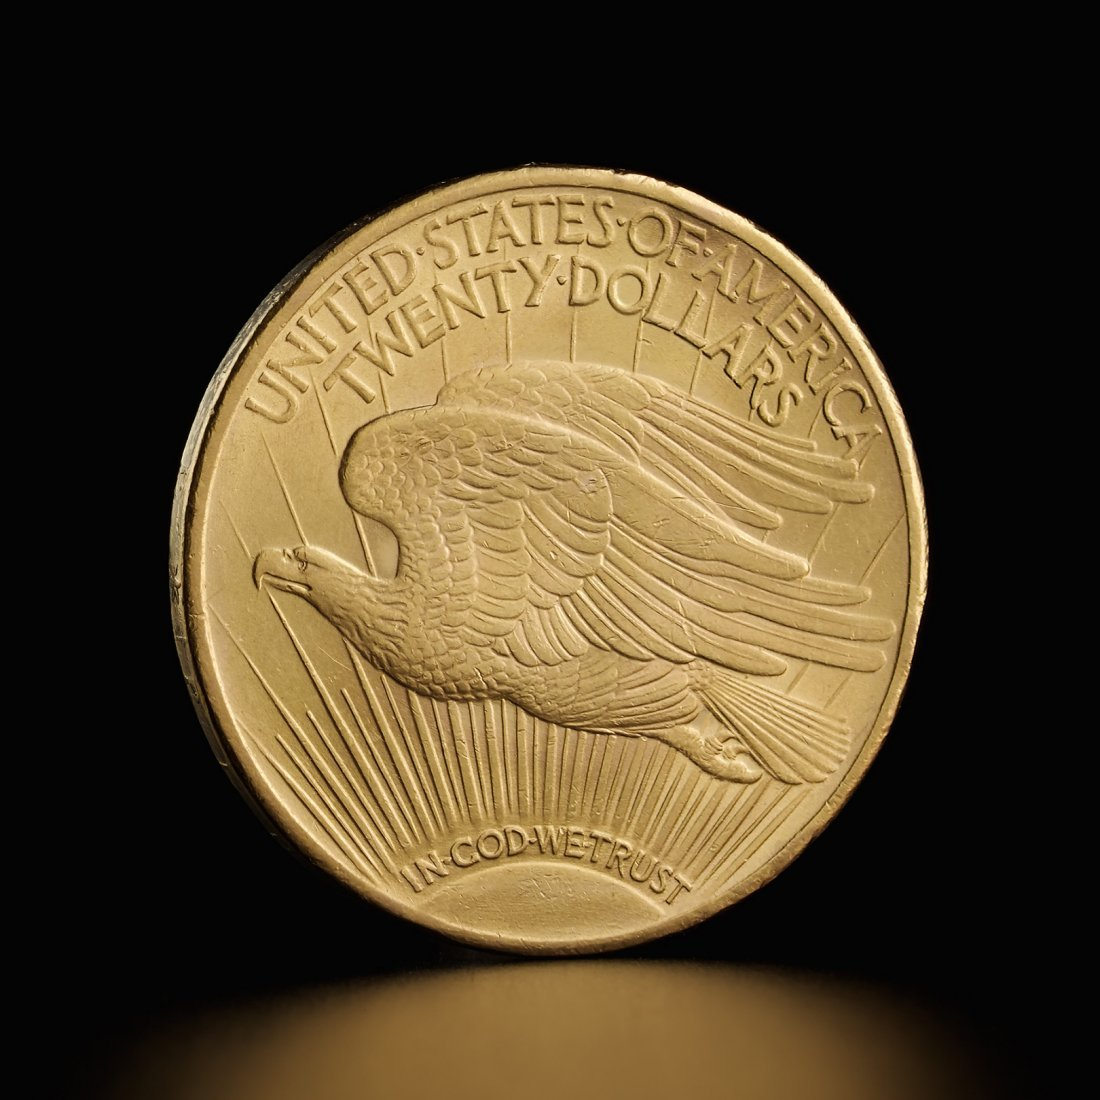 American Saint Gaudens Double Eagle gold coin